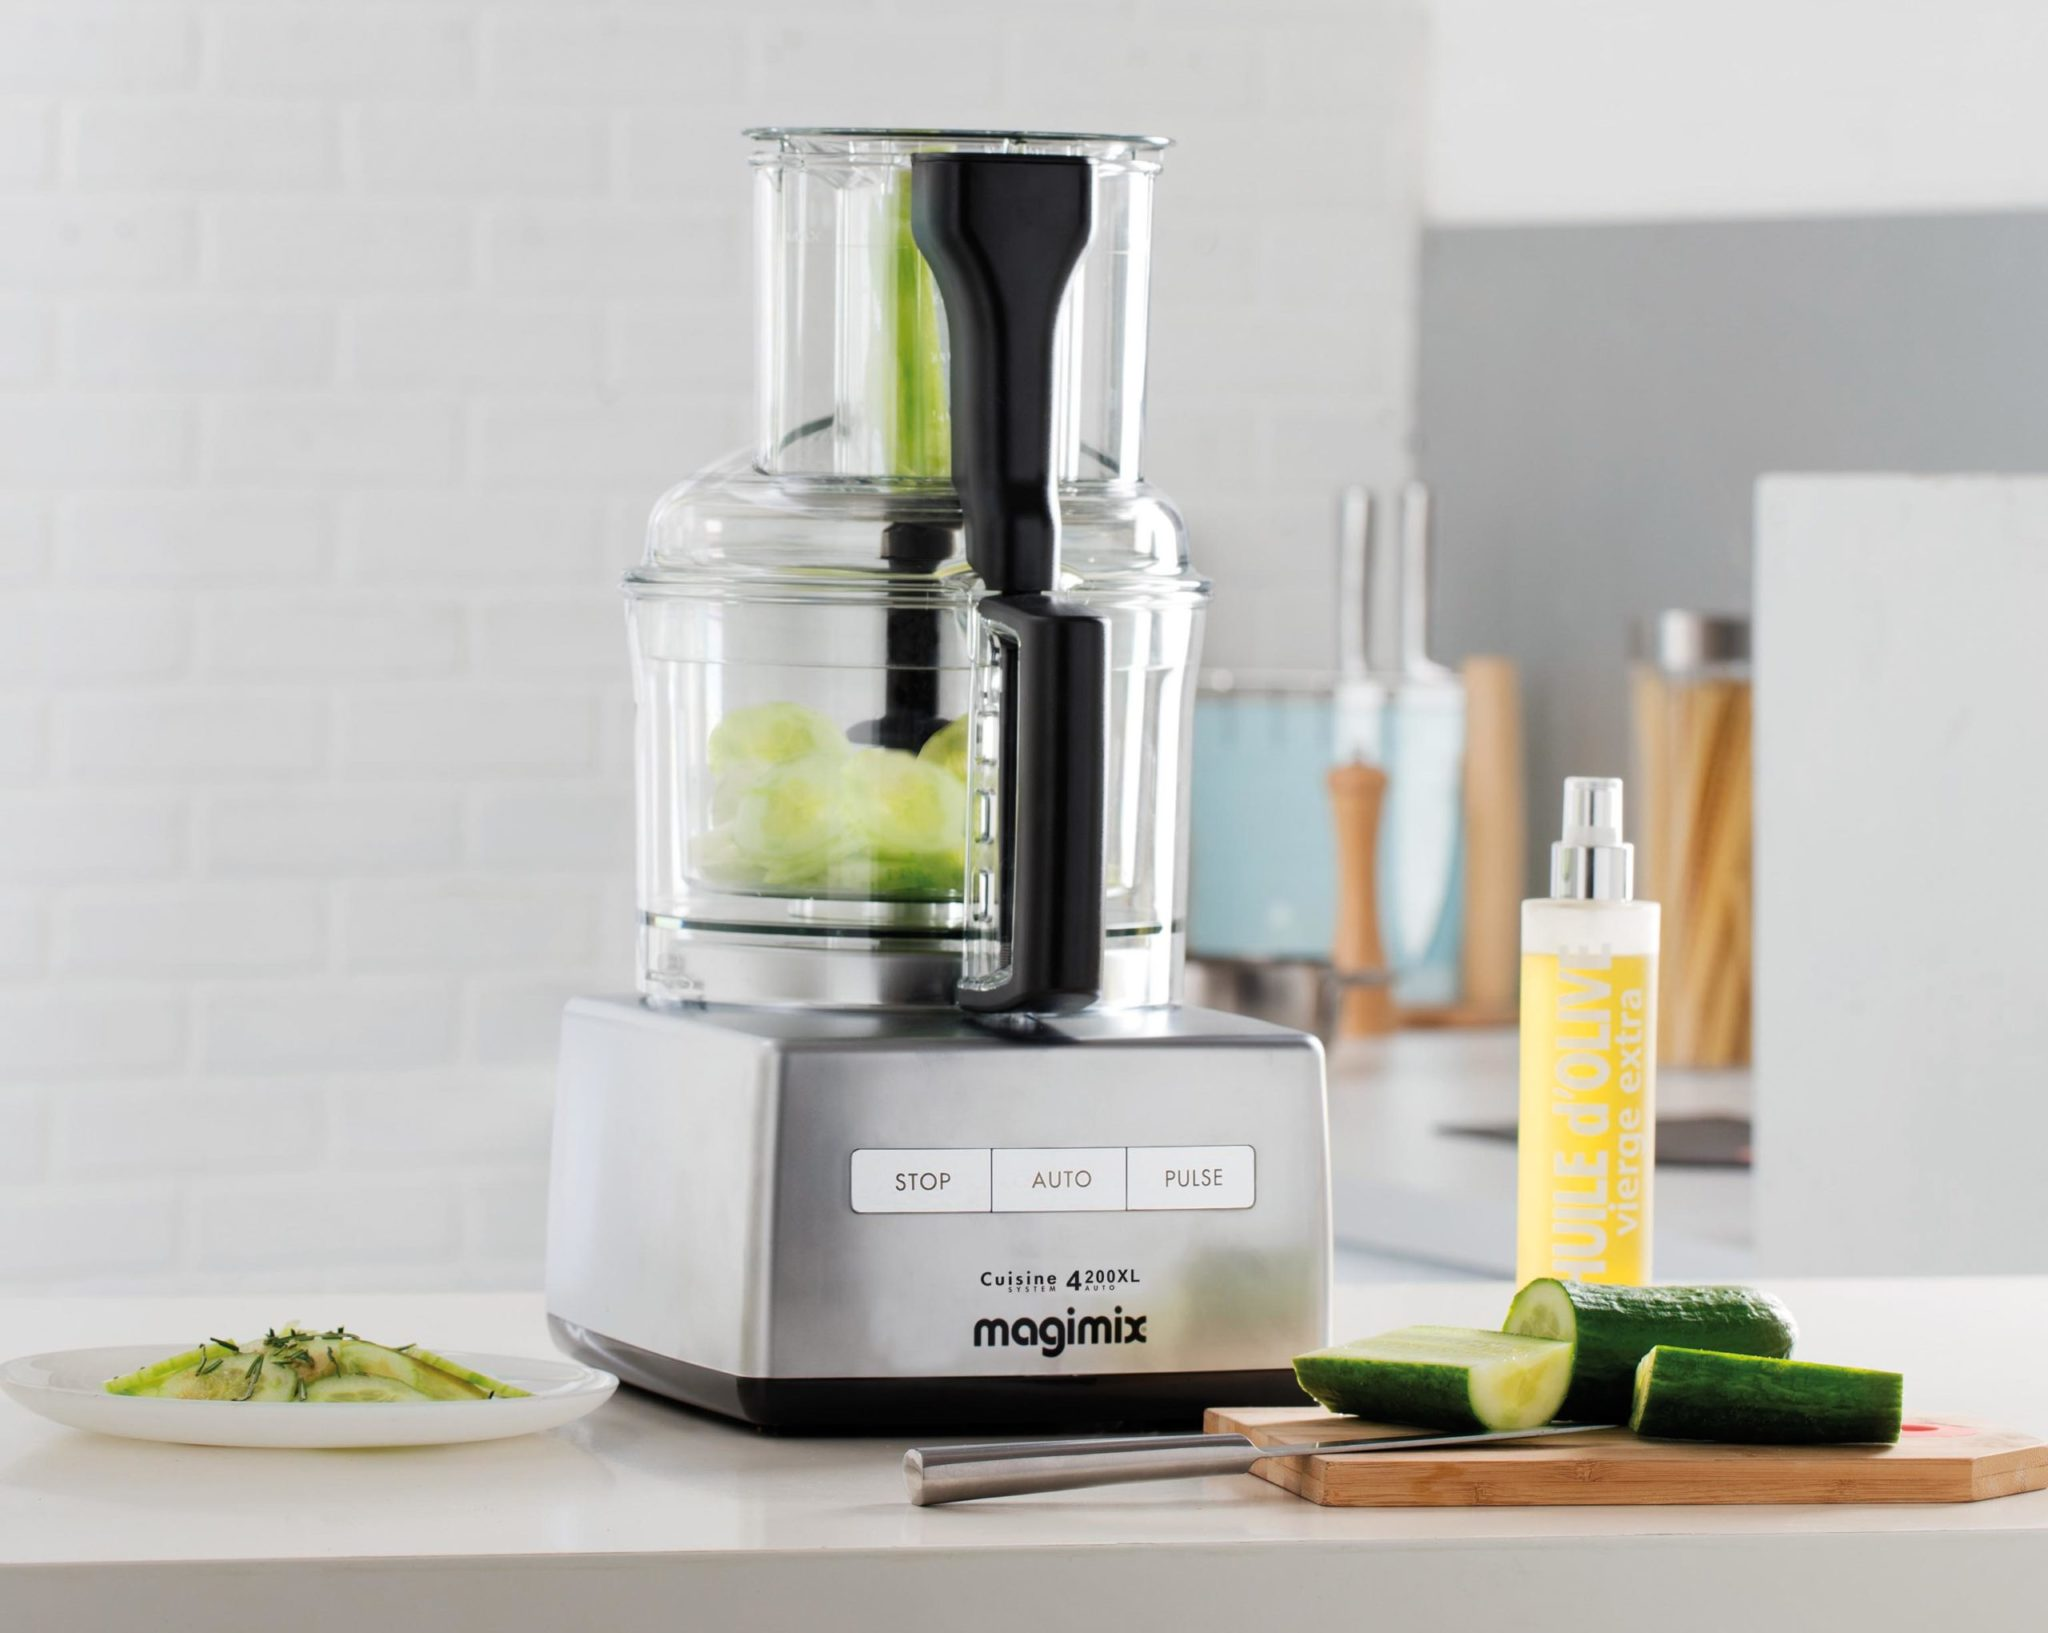 magimix robot da cucina cs 4200xl